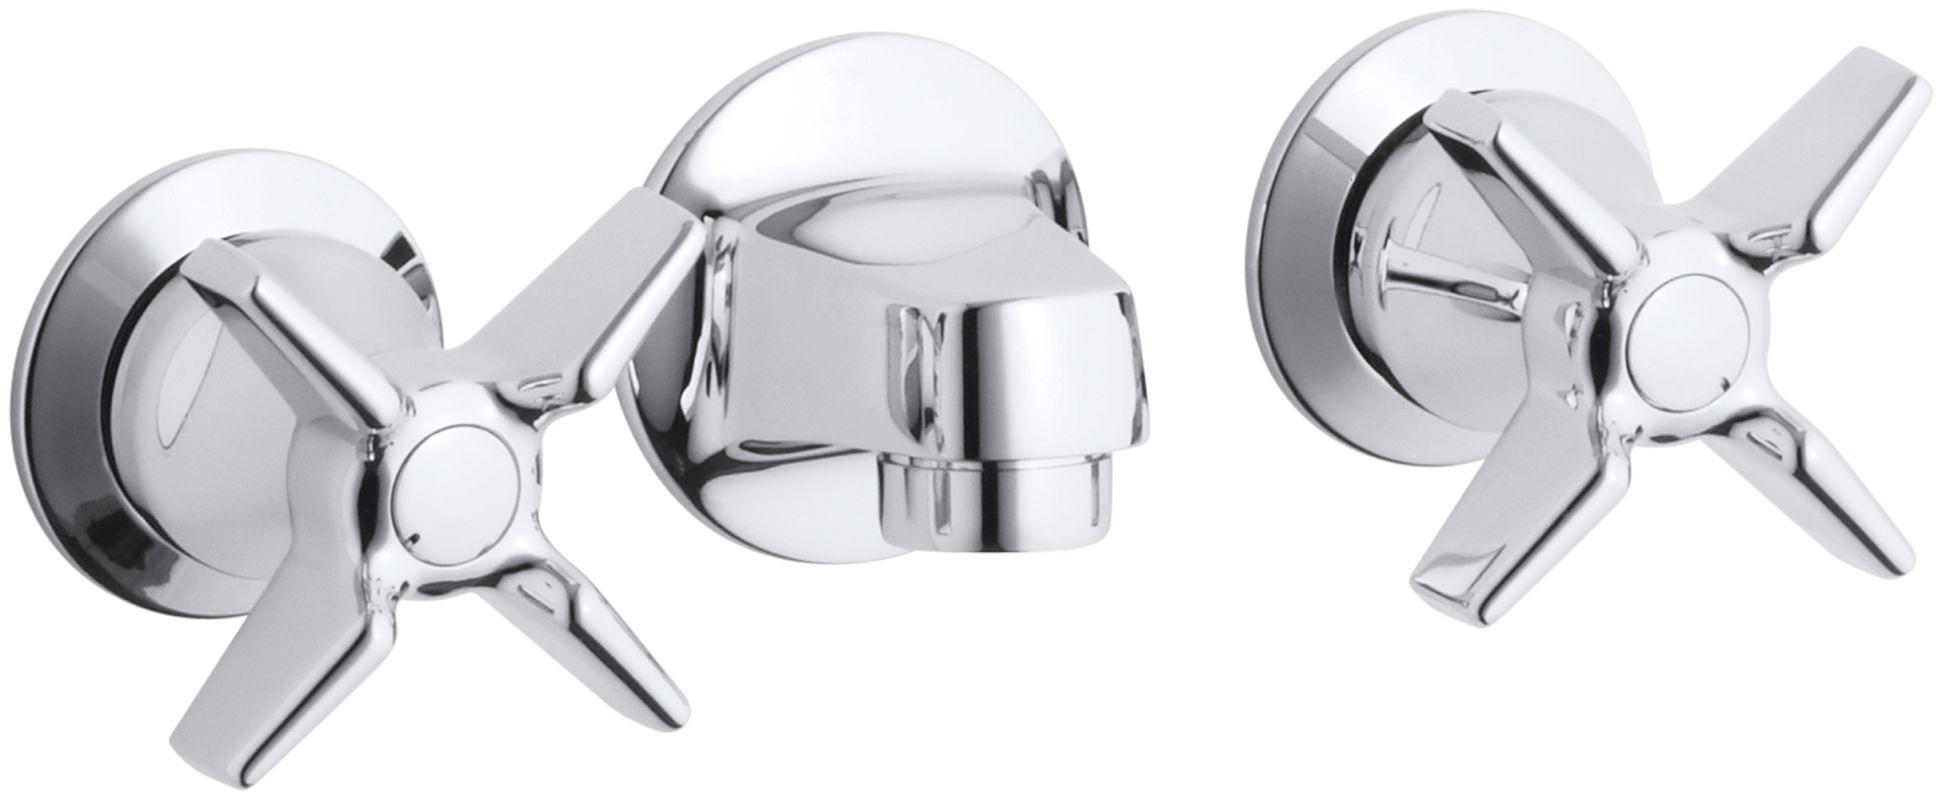 kohler k 8046 3a cp polished chrome triton wall mount bathroom faucet